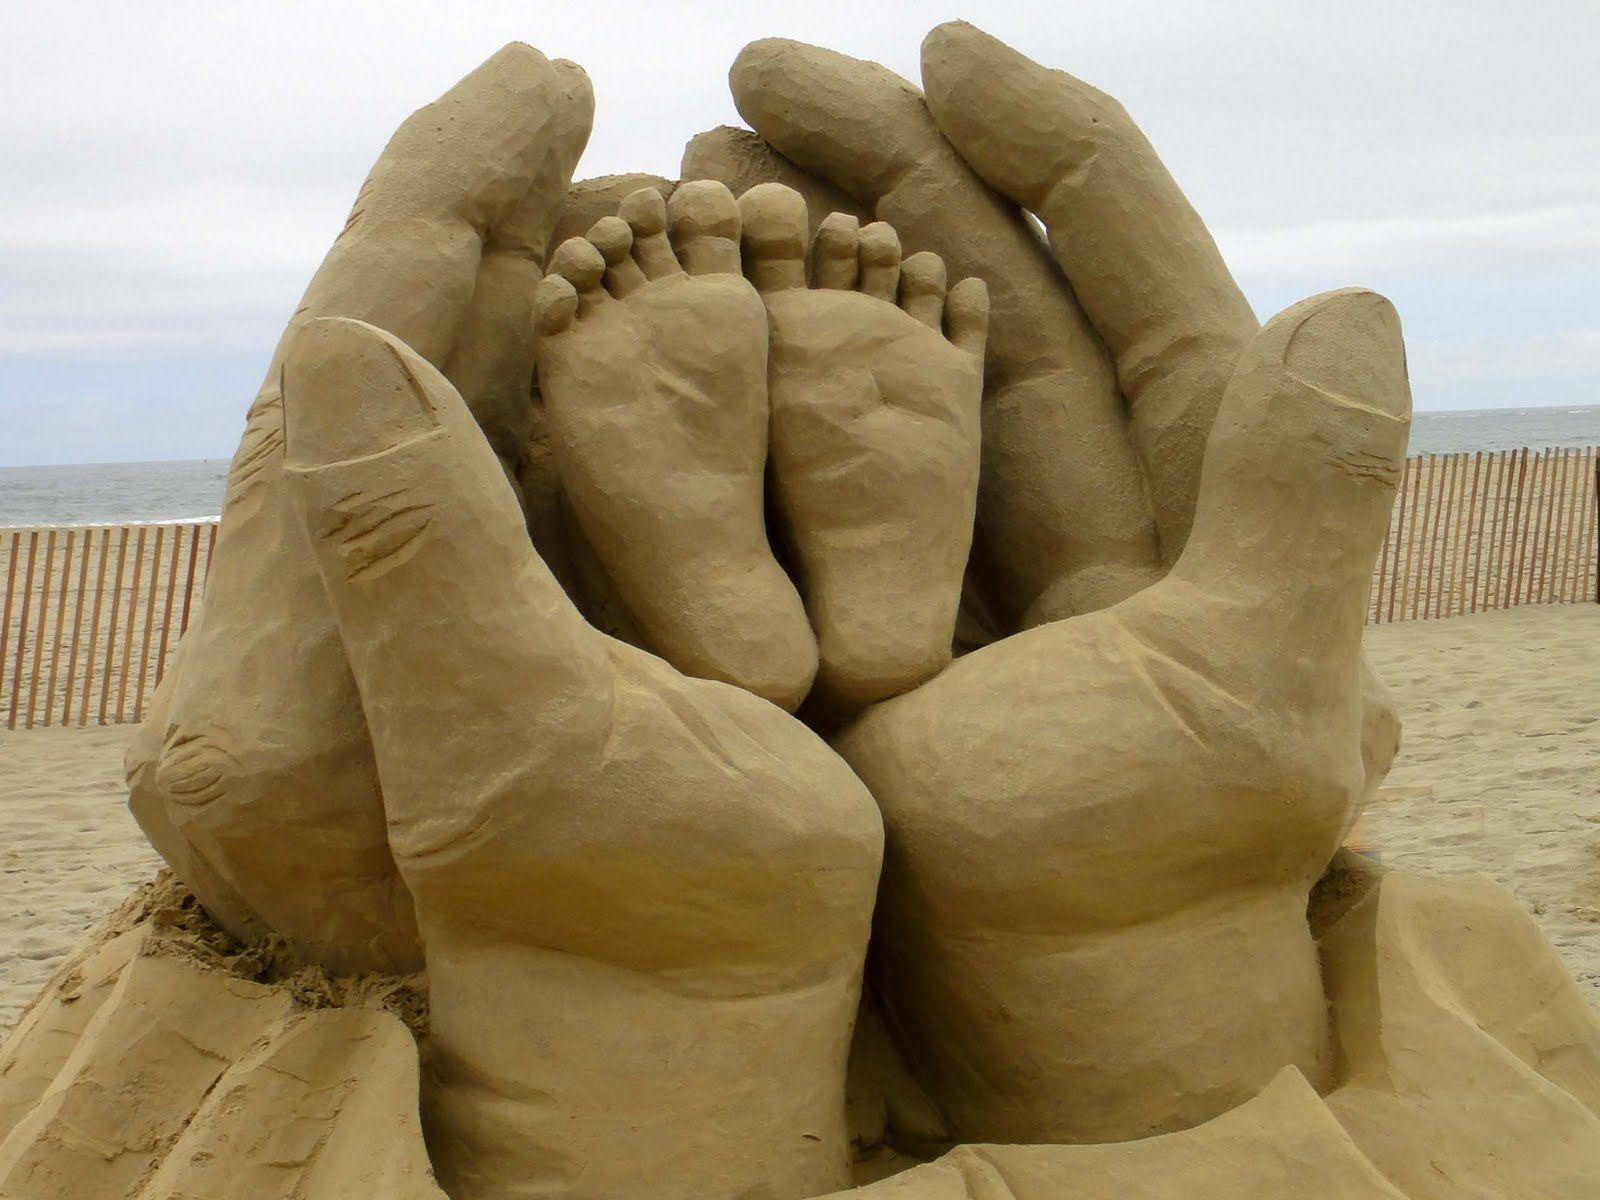 Joe S Retirement Blog Sand Sculpting Hampton Beach New